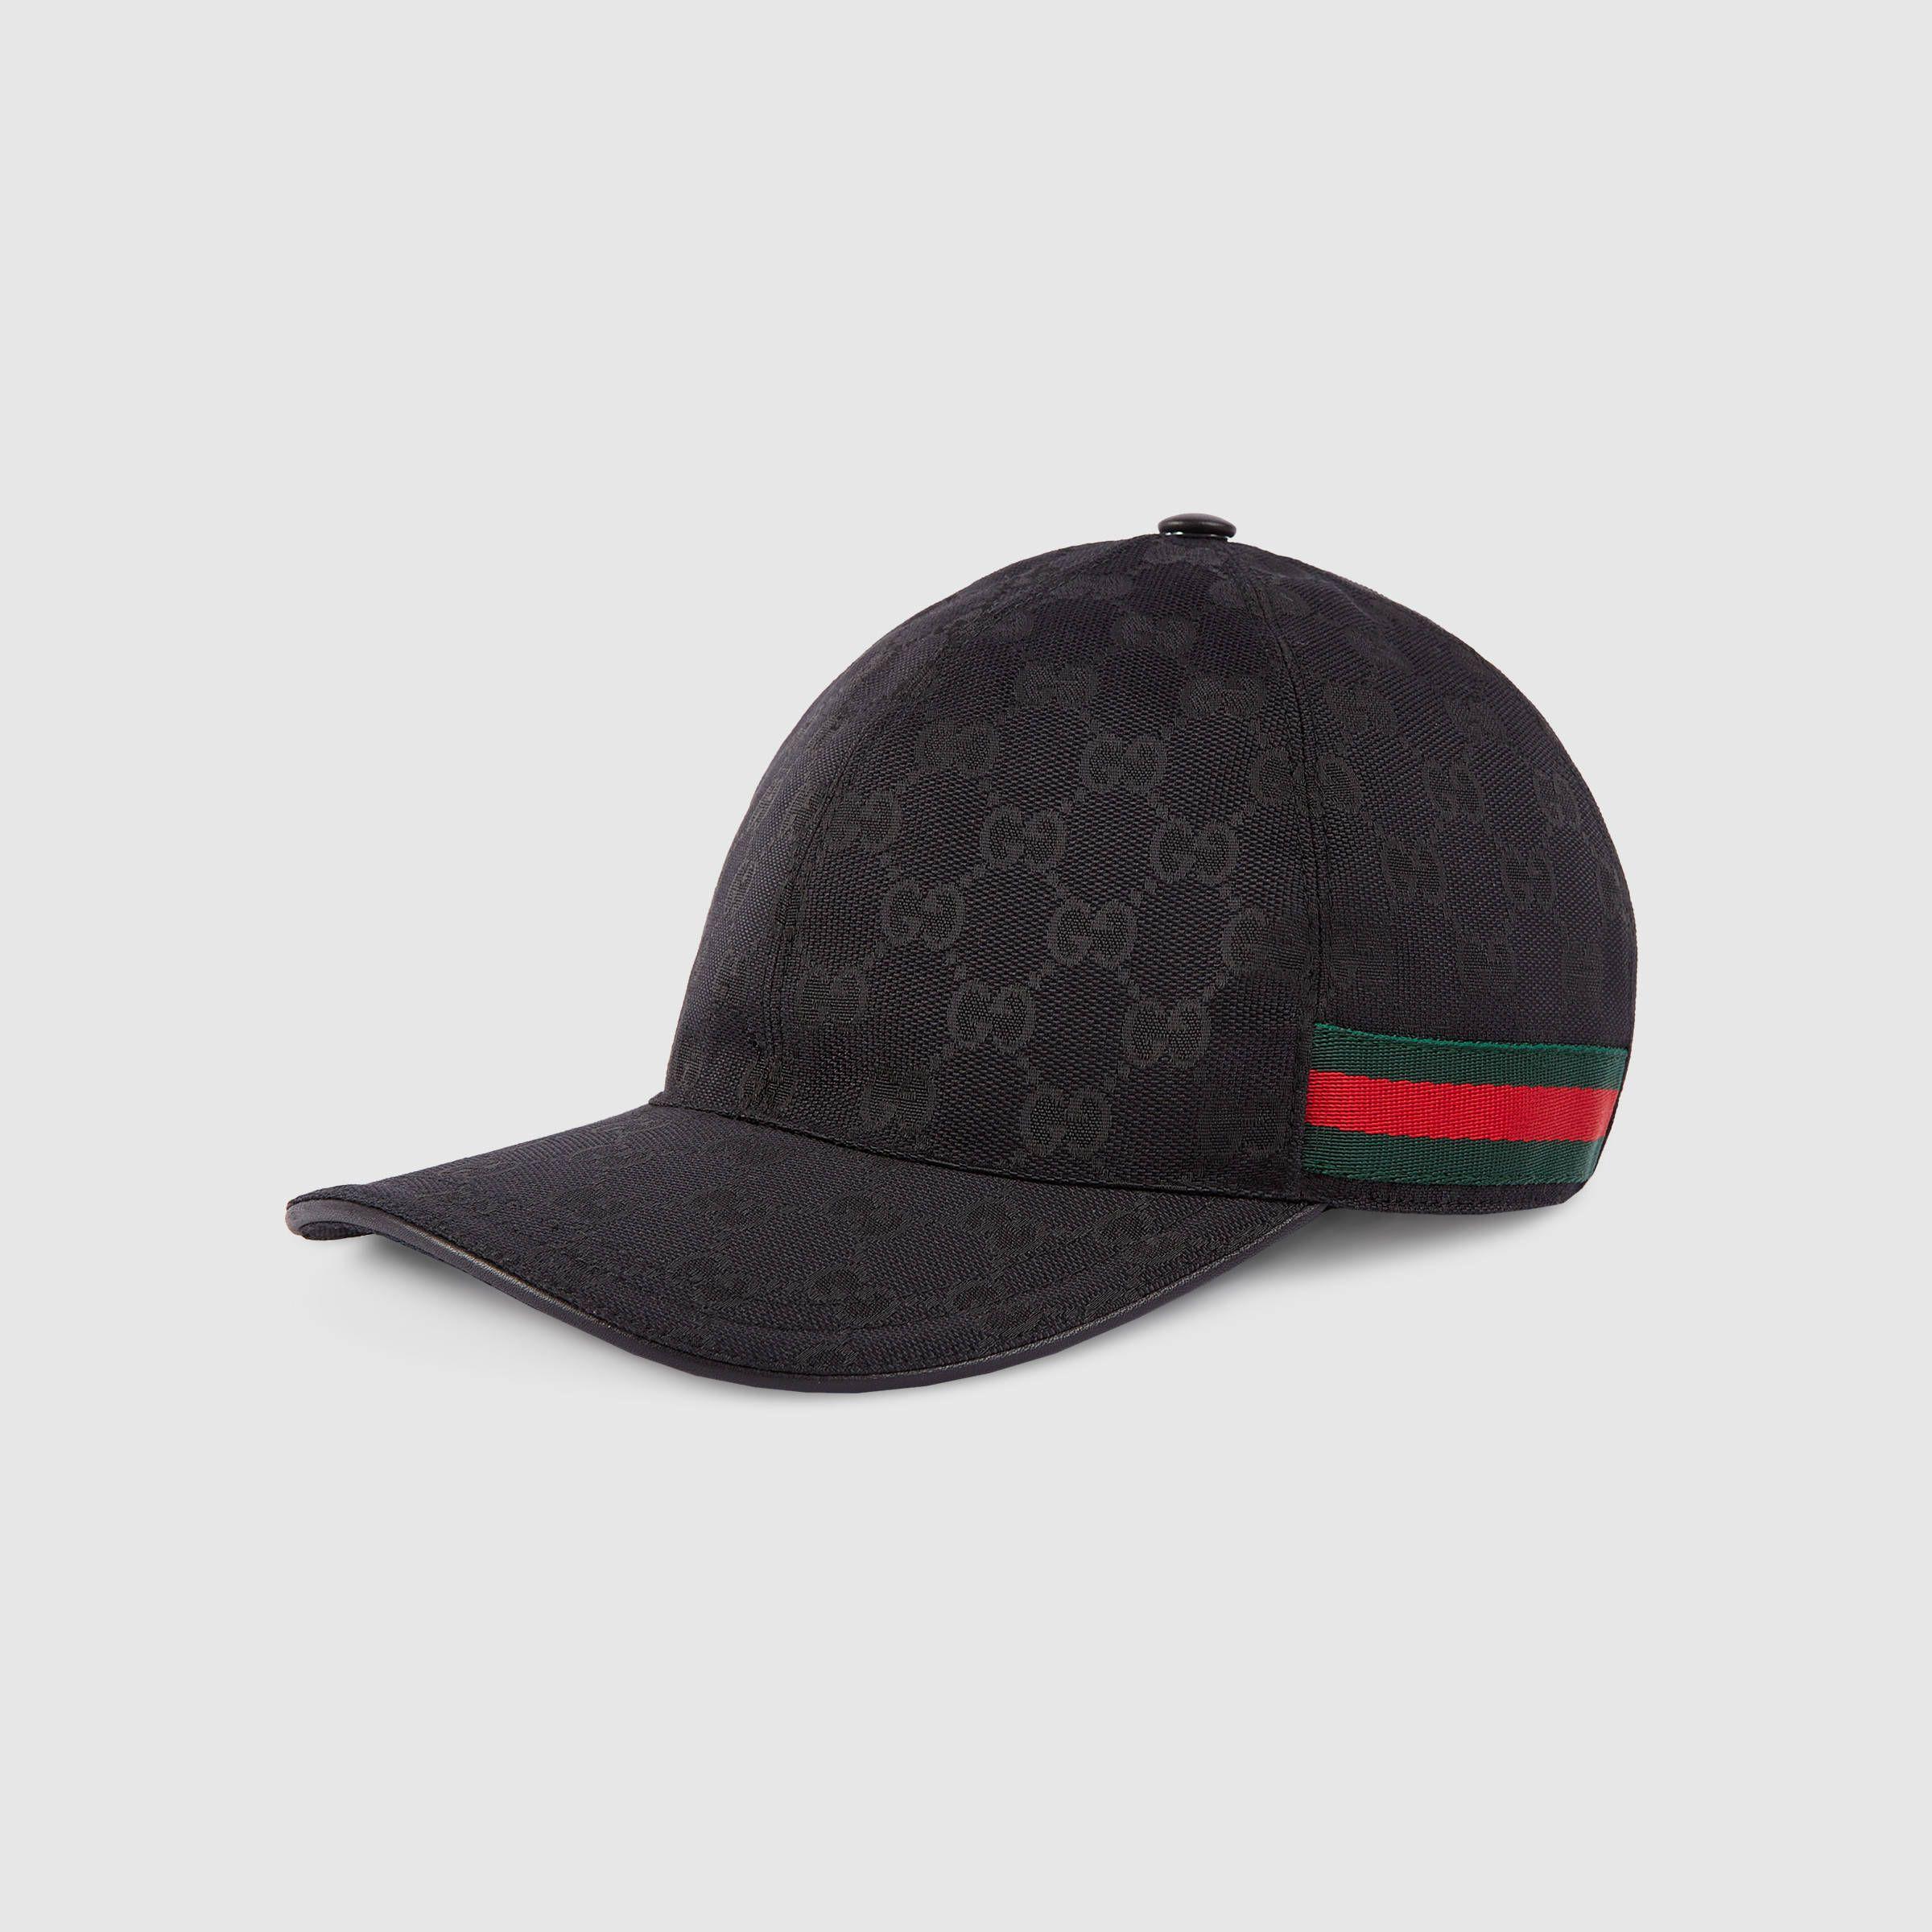 Gucci Original Gg Canvas Baseball Hat With Web Detail 2 Baseball Hats Mens Hats Baseball Hats For Men